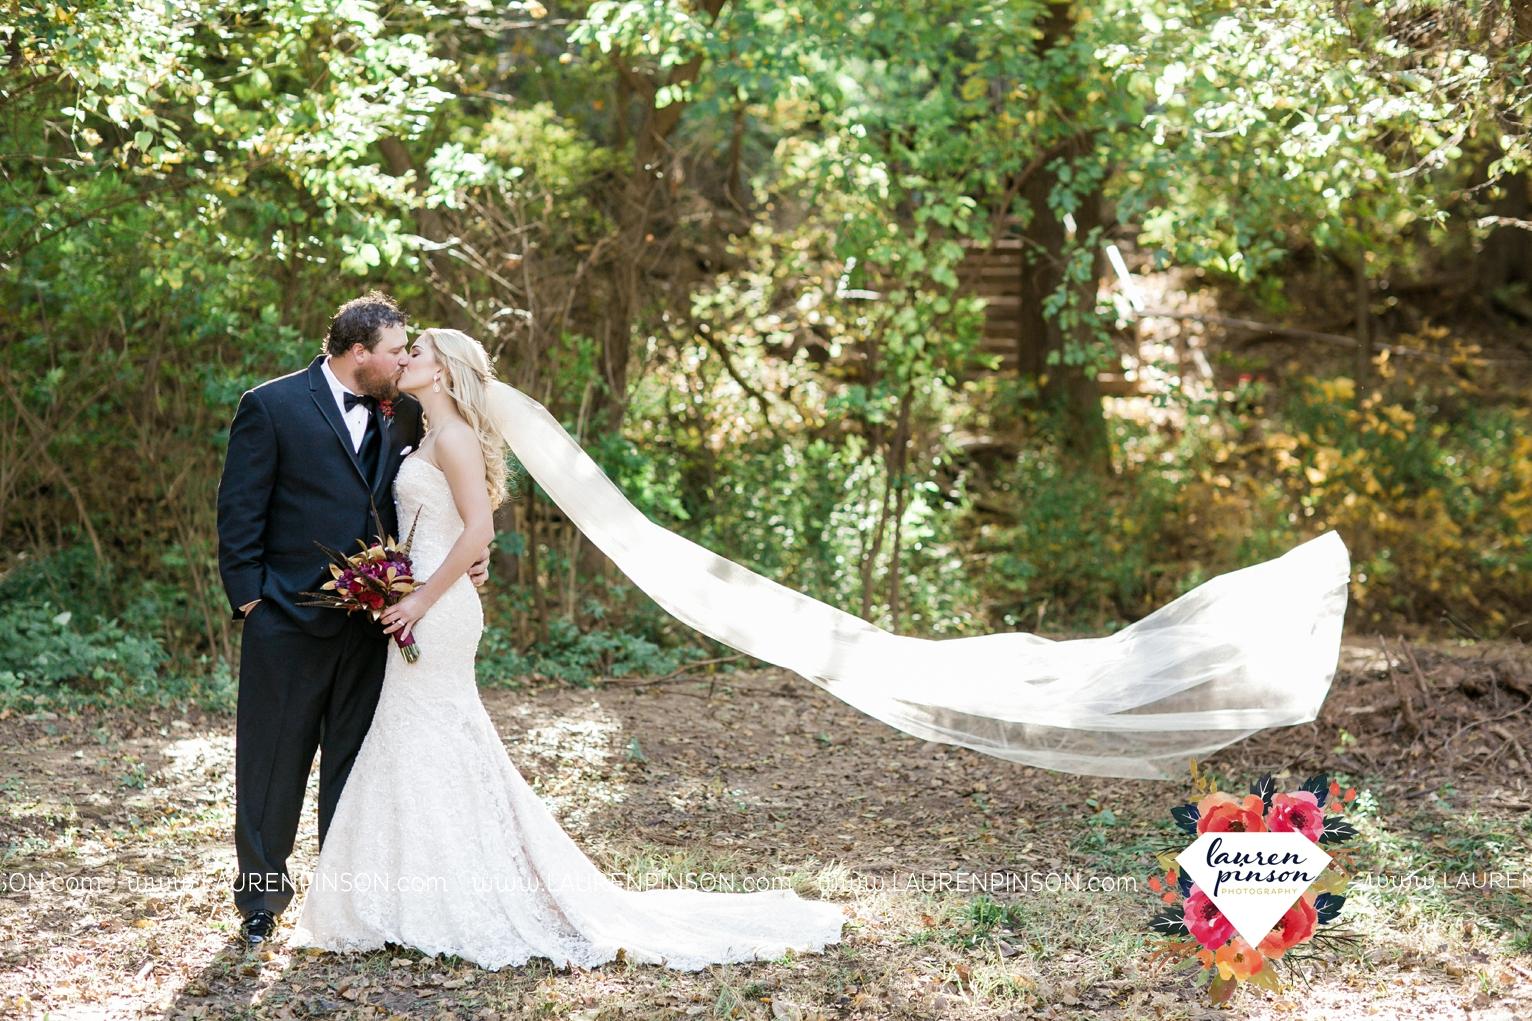 rustic-wichita-falls-texas-wedding-photographer-gold-glam-mayfield-events-market-street-united-allue-bridals-fall_1738.jpg